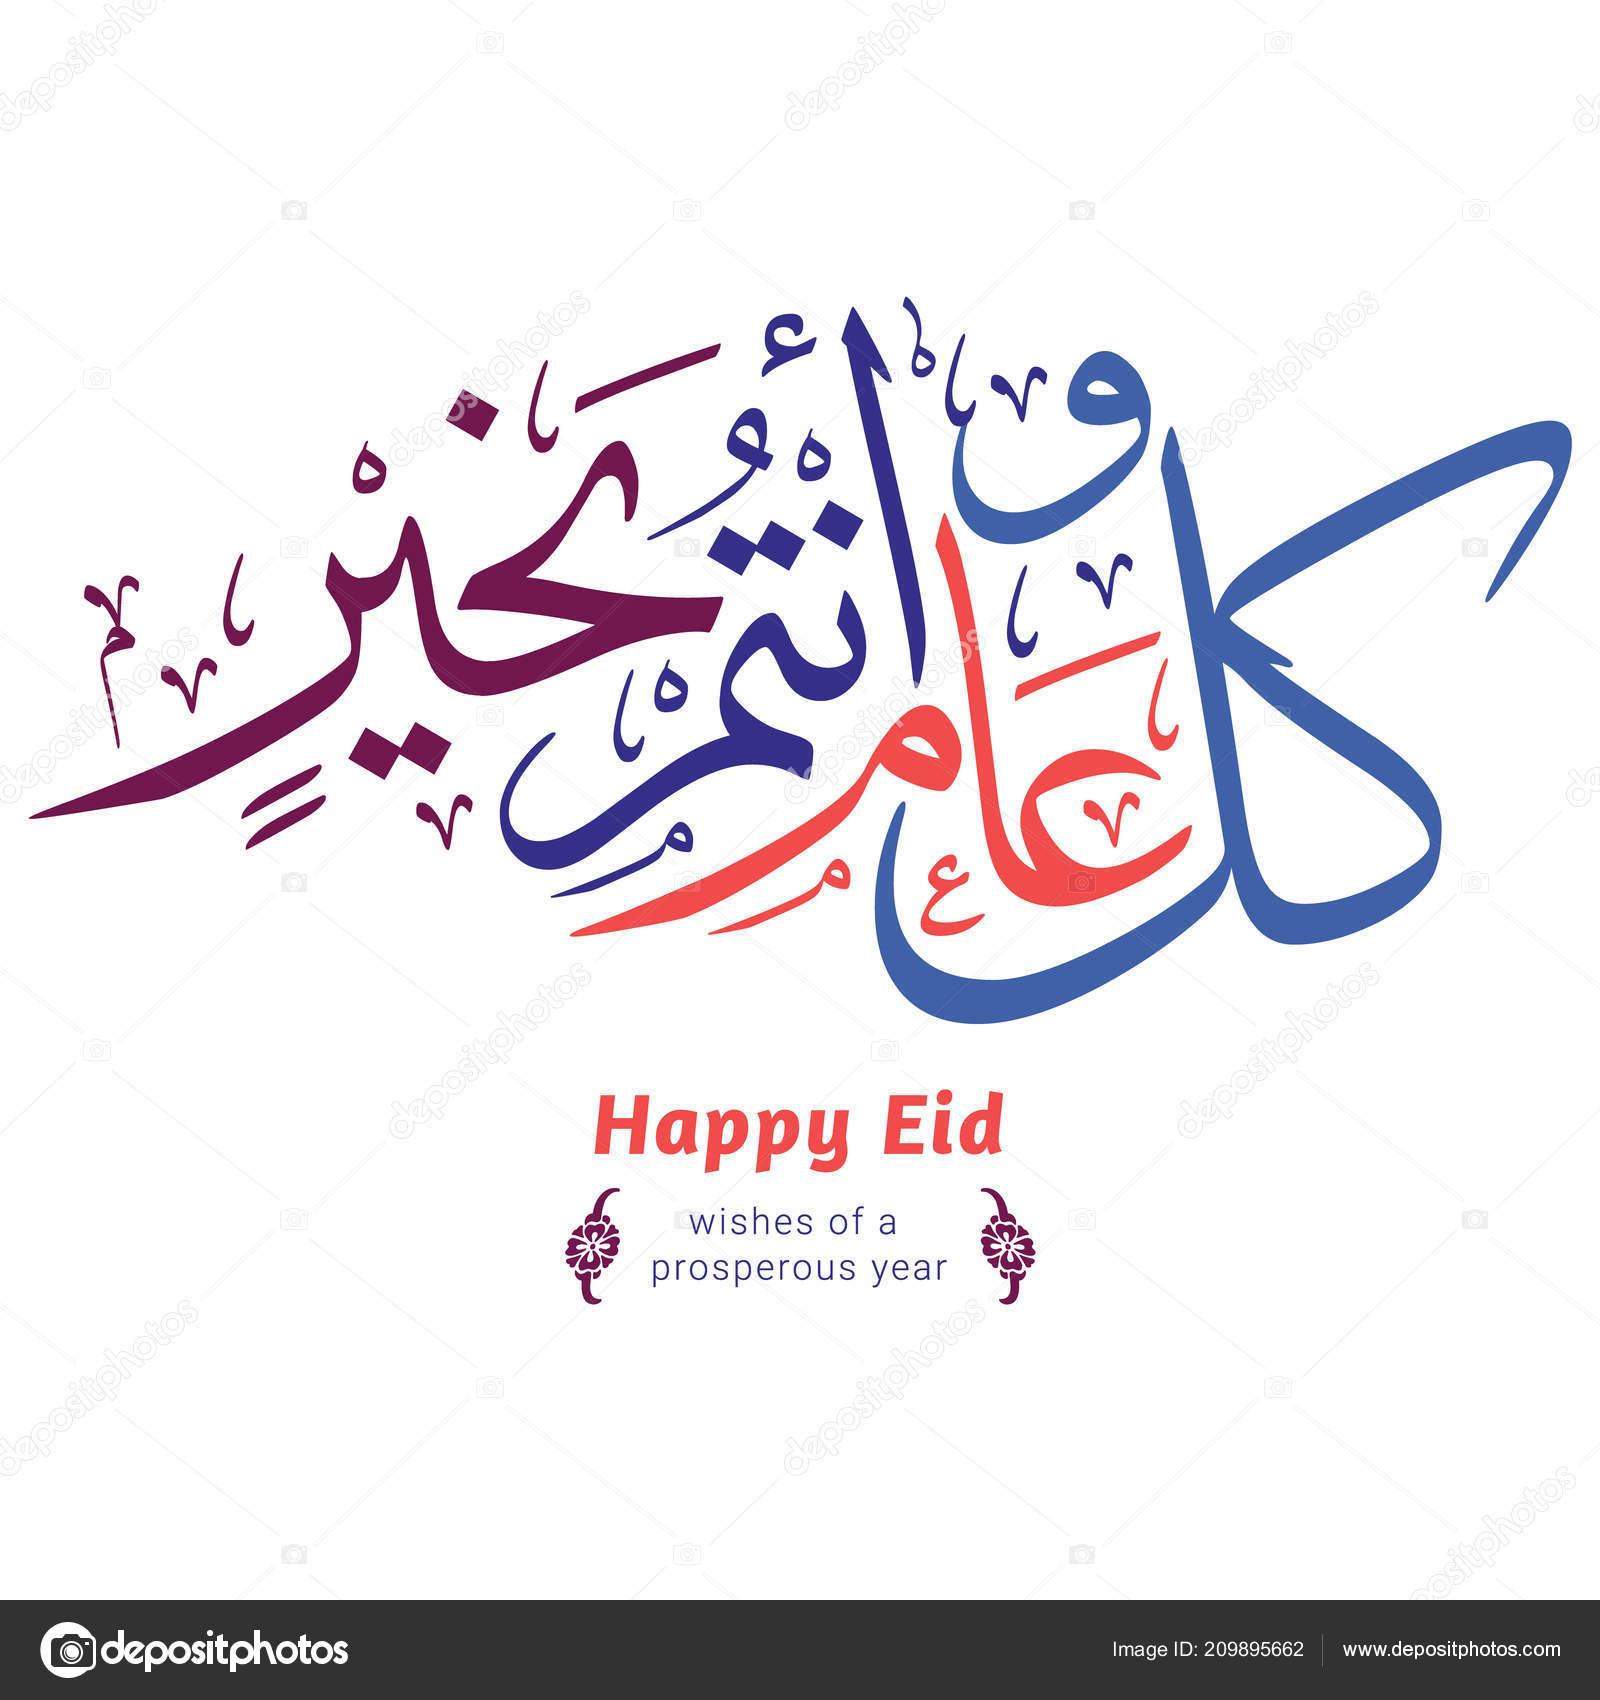 Wishes Prosperous Year Arabic Calligraphy Translation Wishes ...